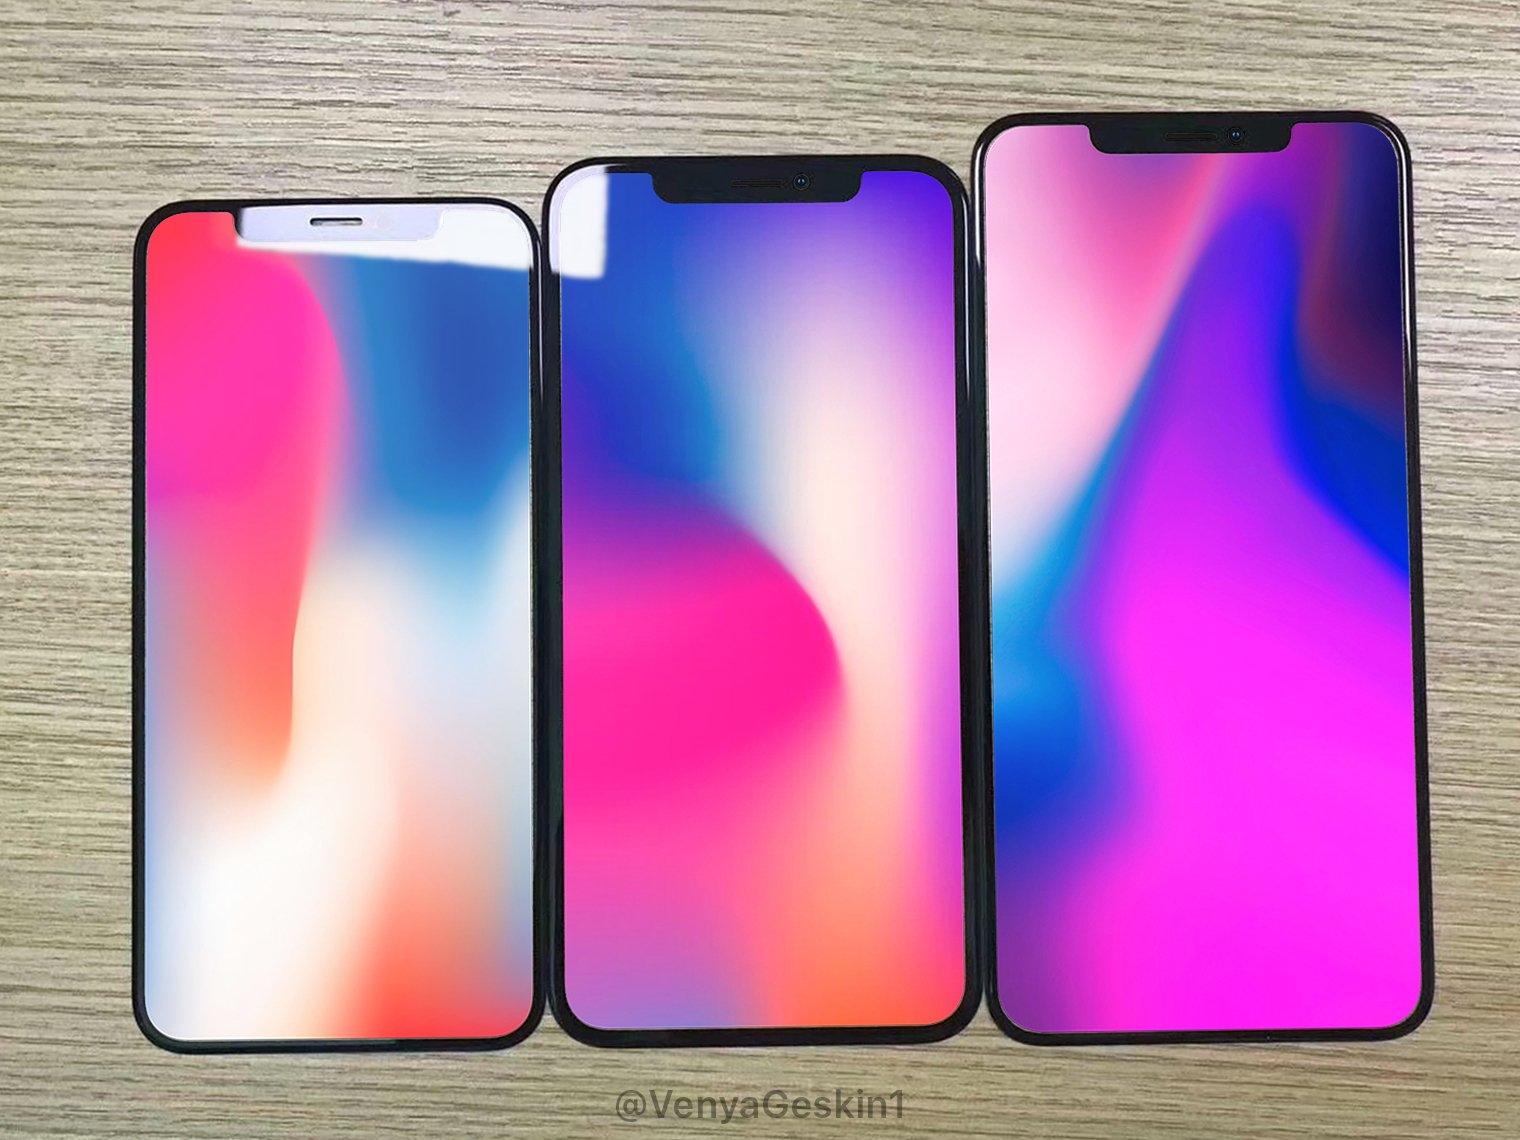 Mockup iPhone 2018